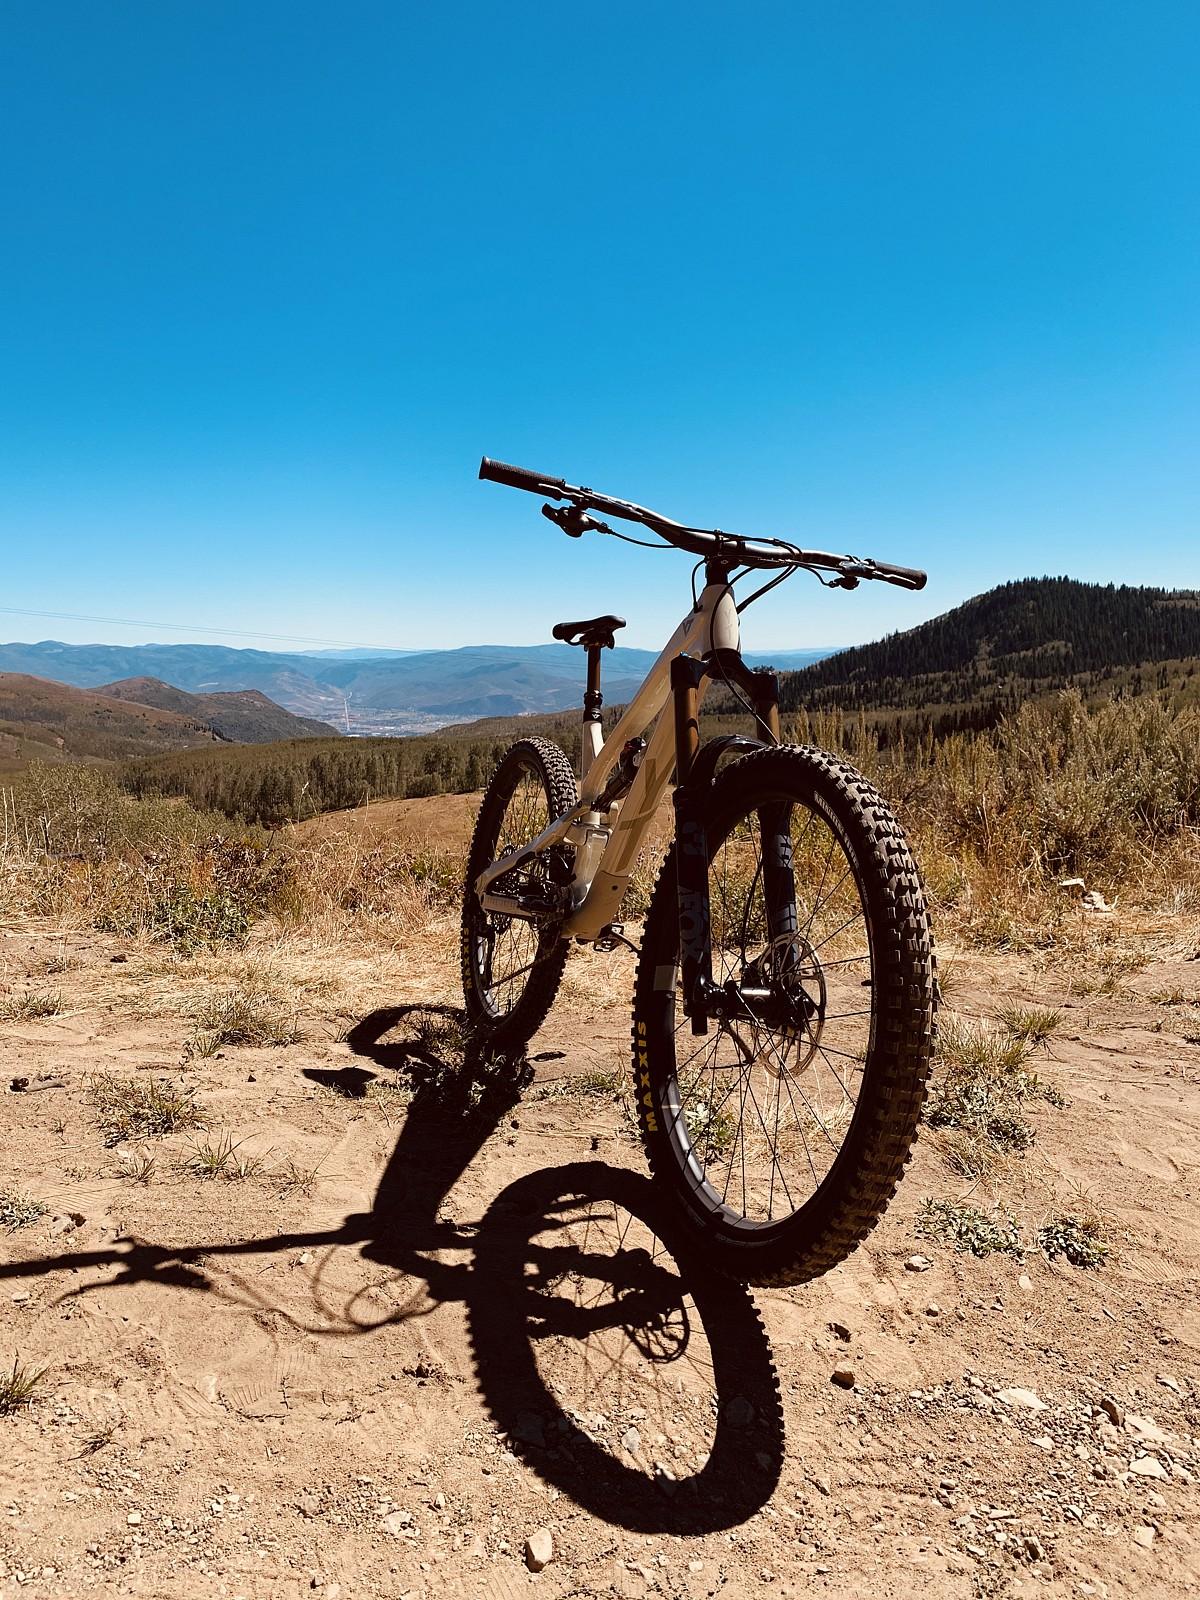 IMG E0210 - jaykalafatis - Mountain Biking Pictures - Vital MTB